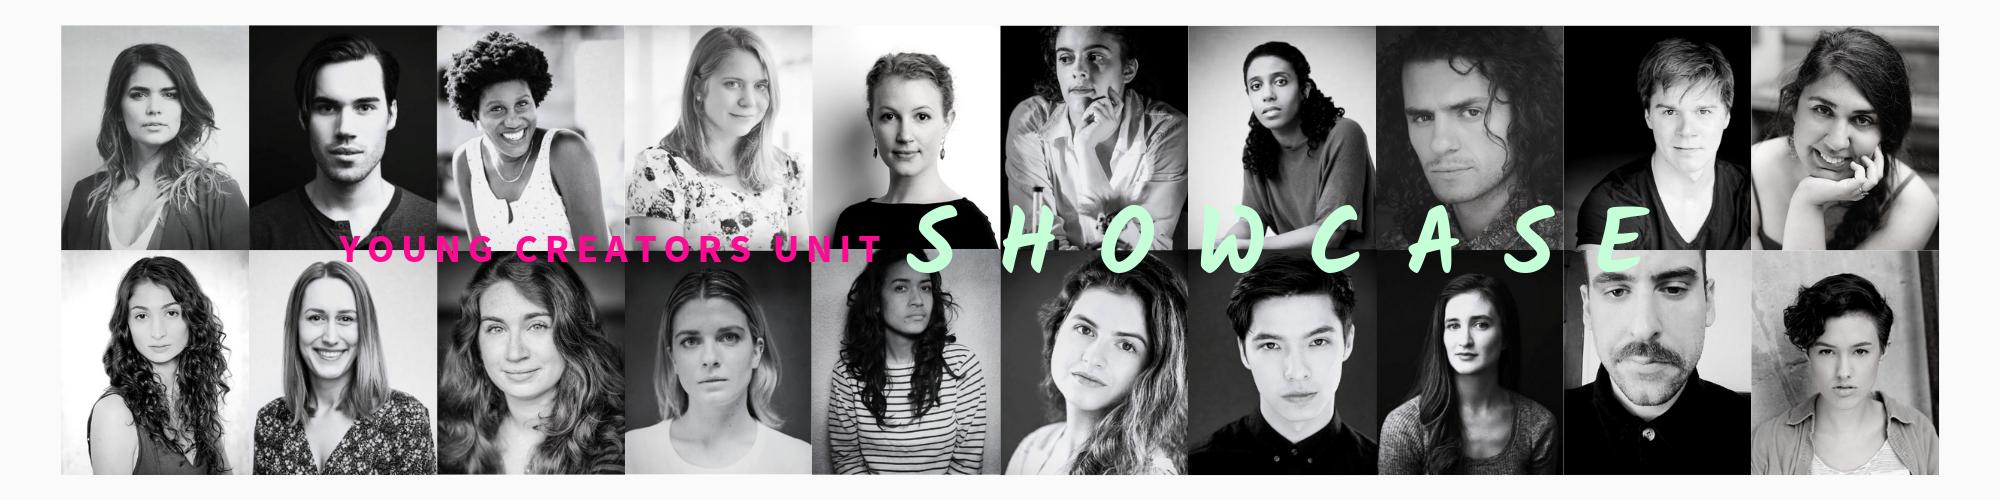 YCU Showcase 2019